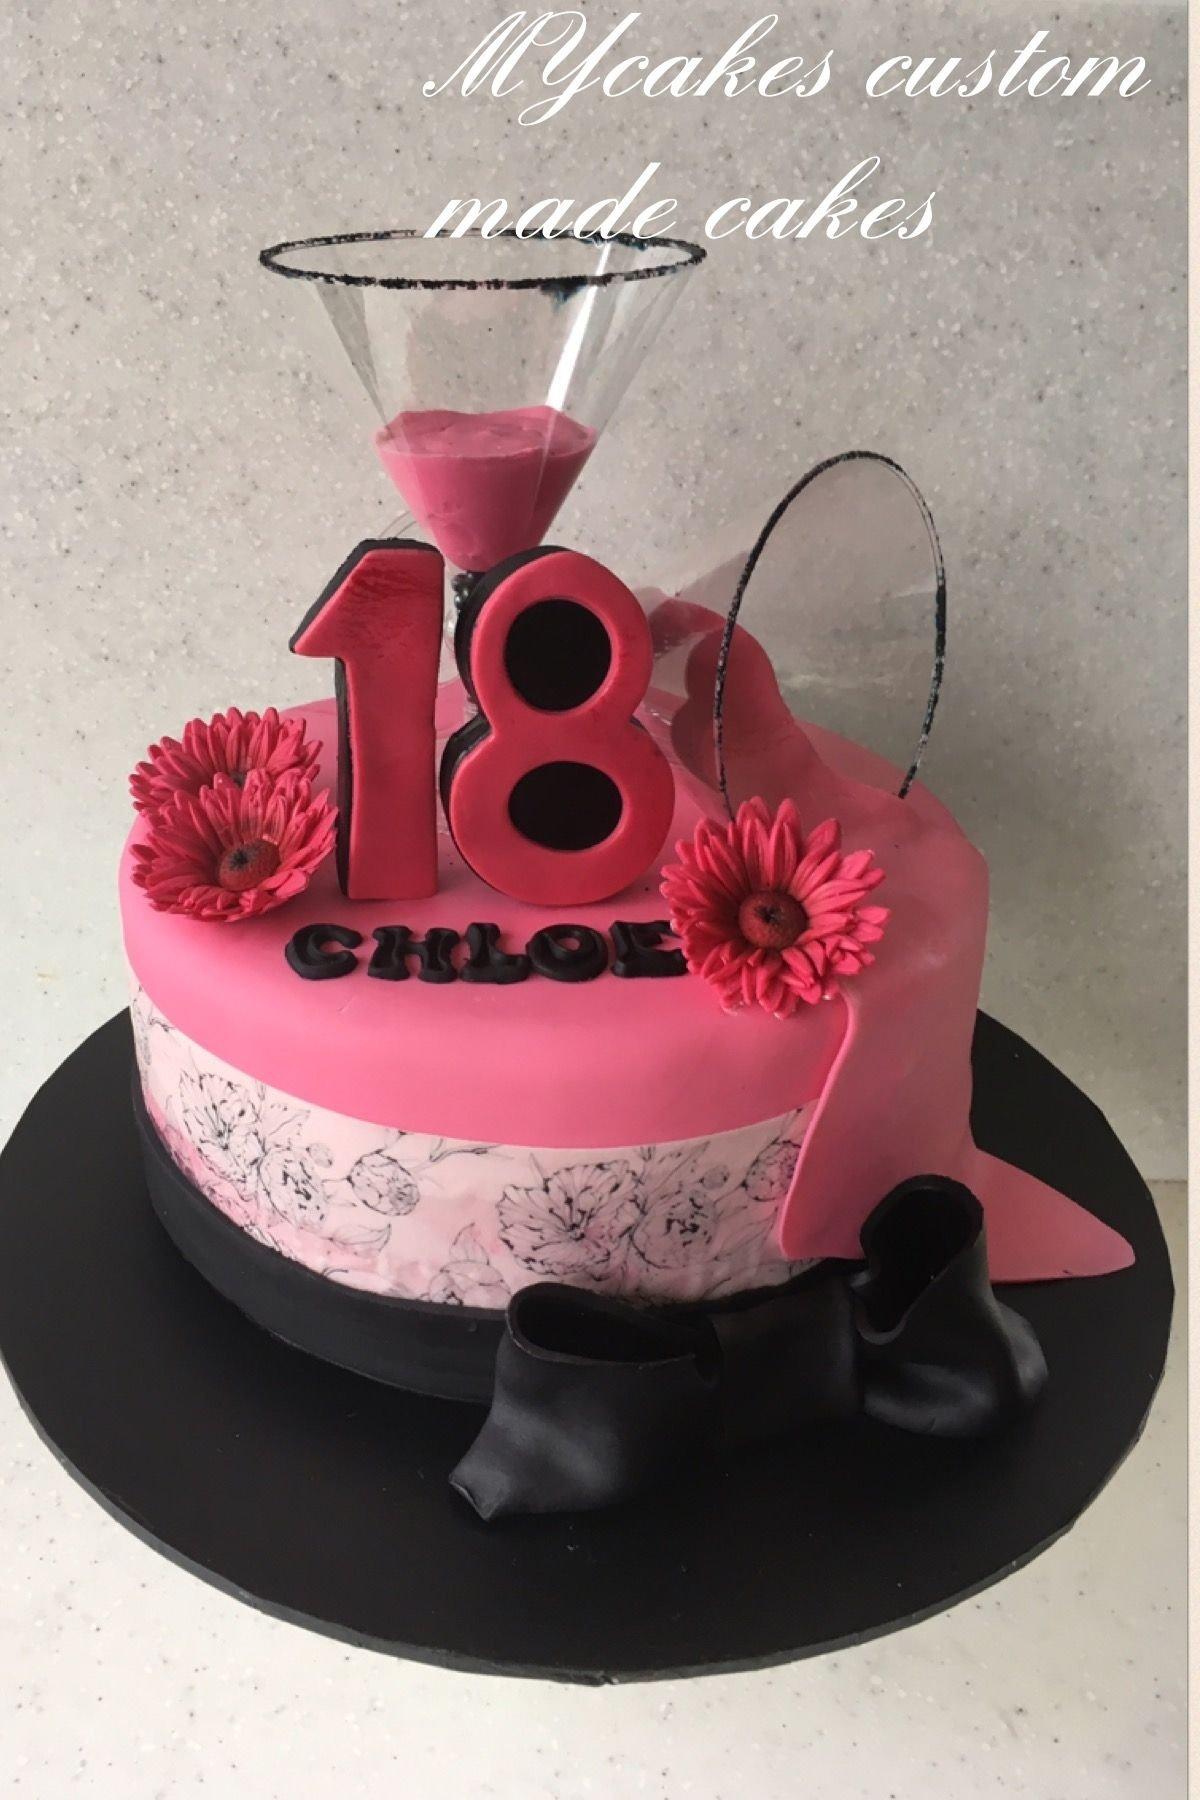 10 Unique 18 Year Old Birthday Ideas Th Cake Djs Durban